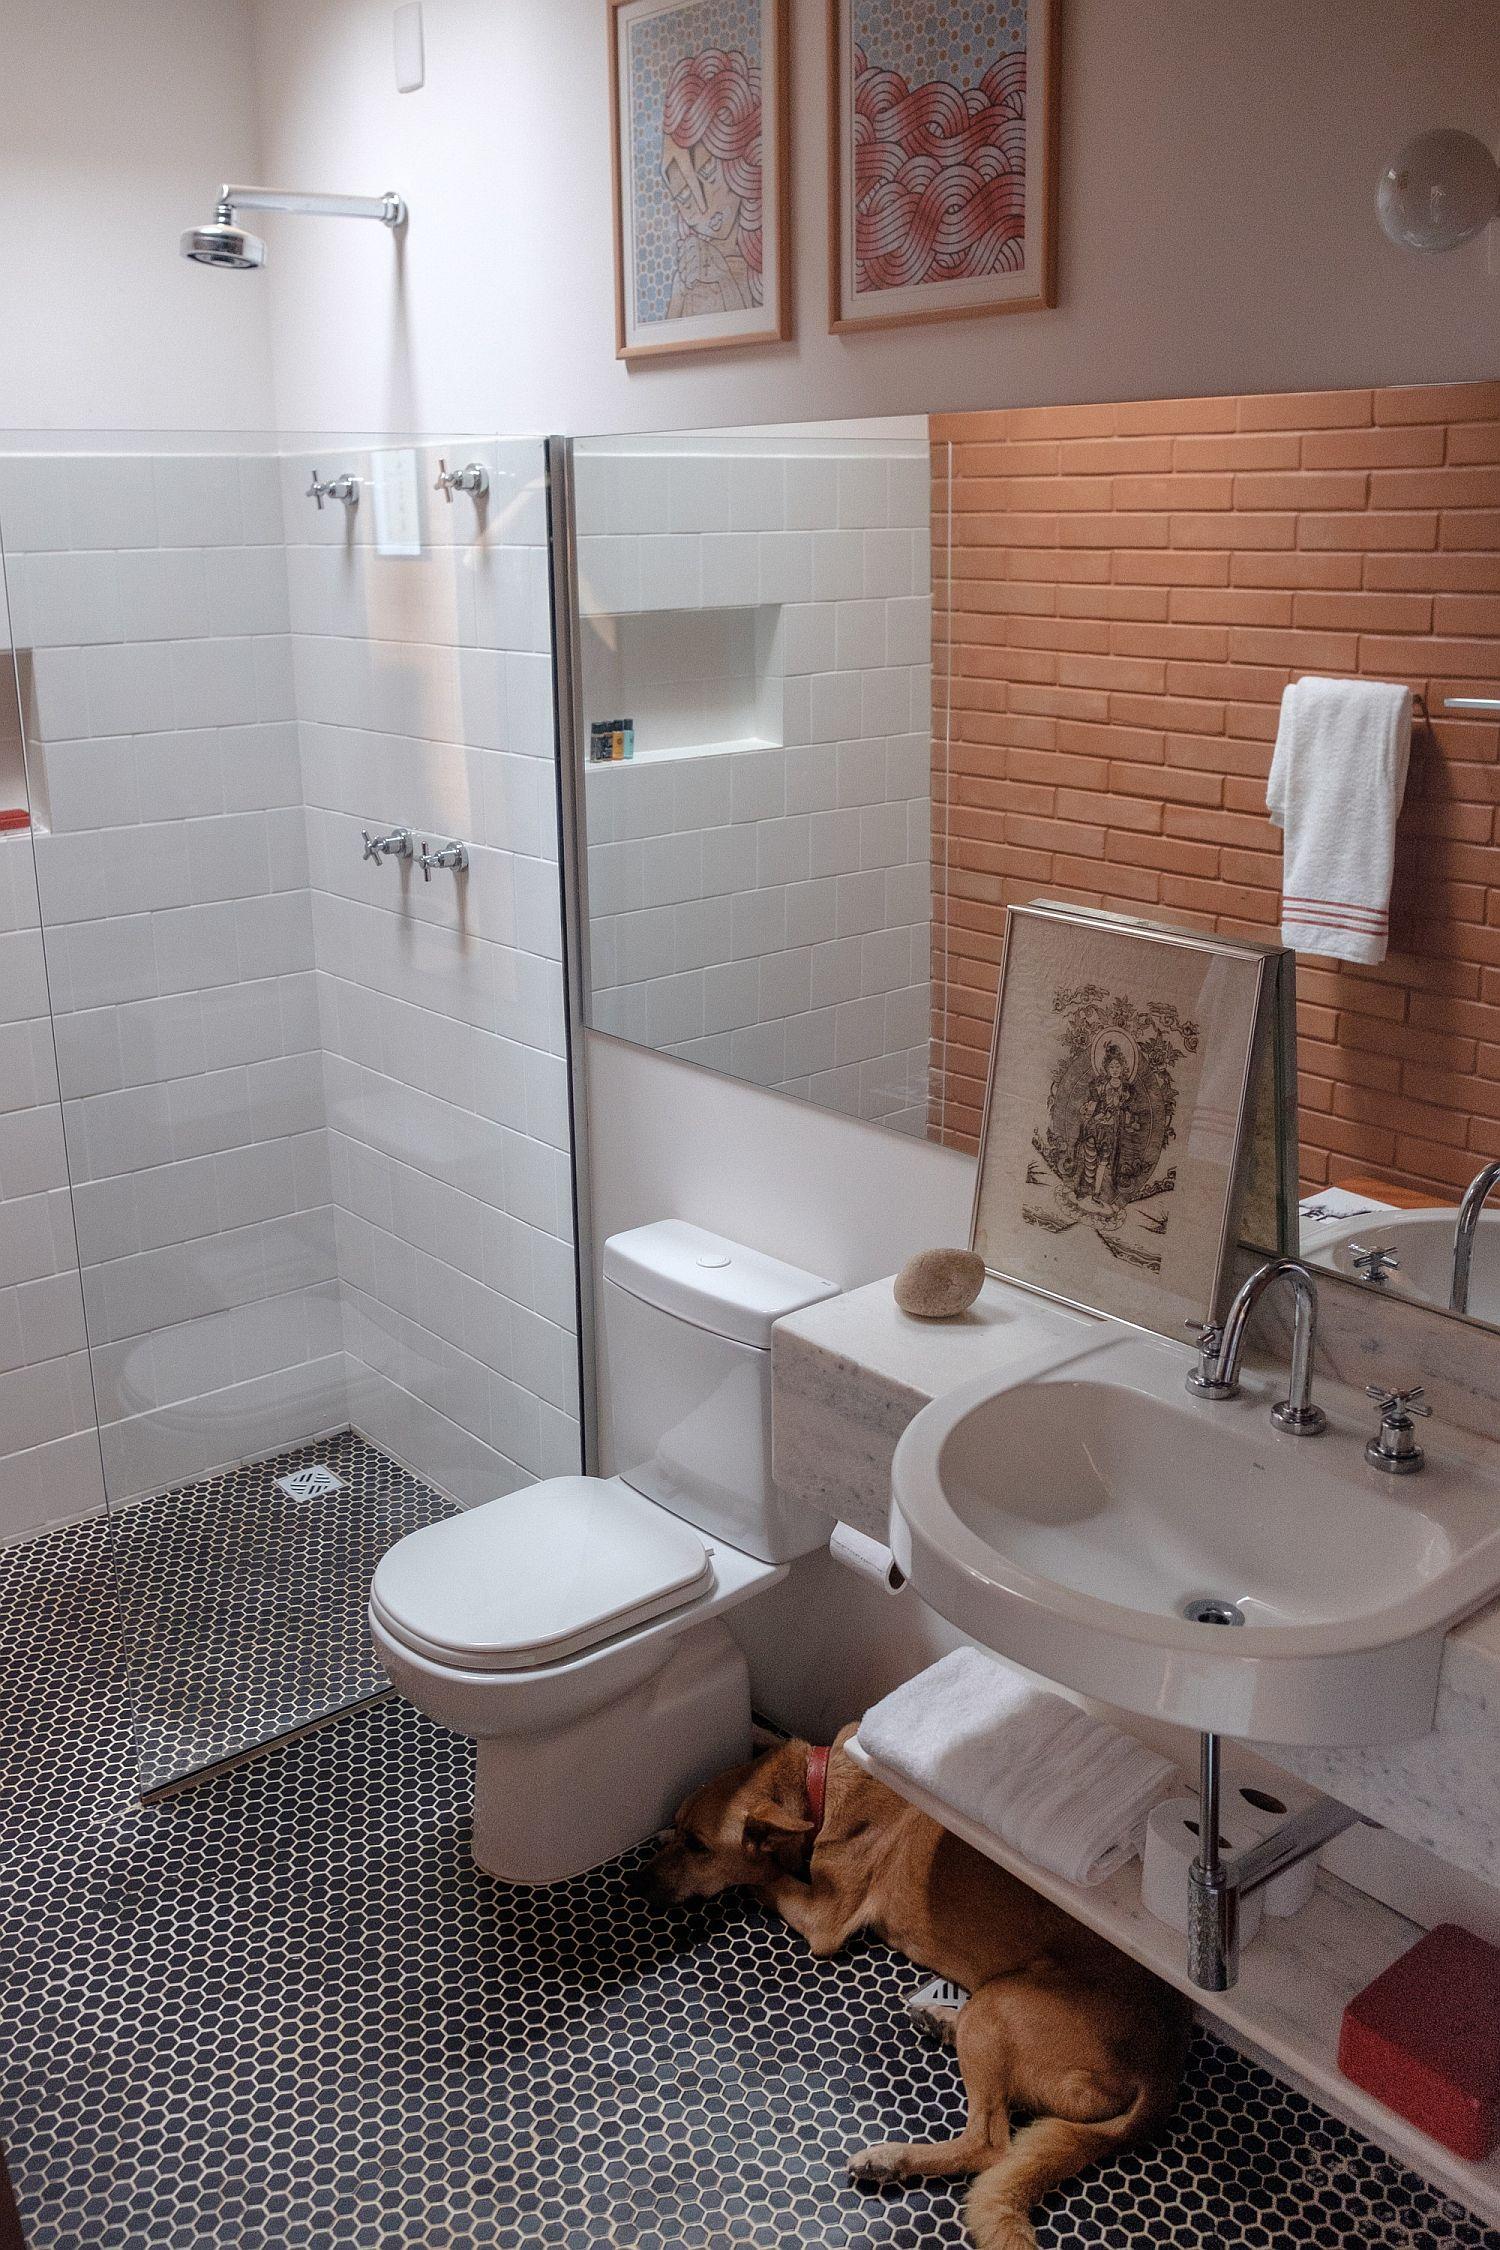 White and brick bathroom of the Brazilian home